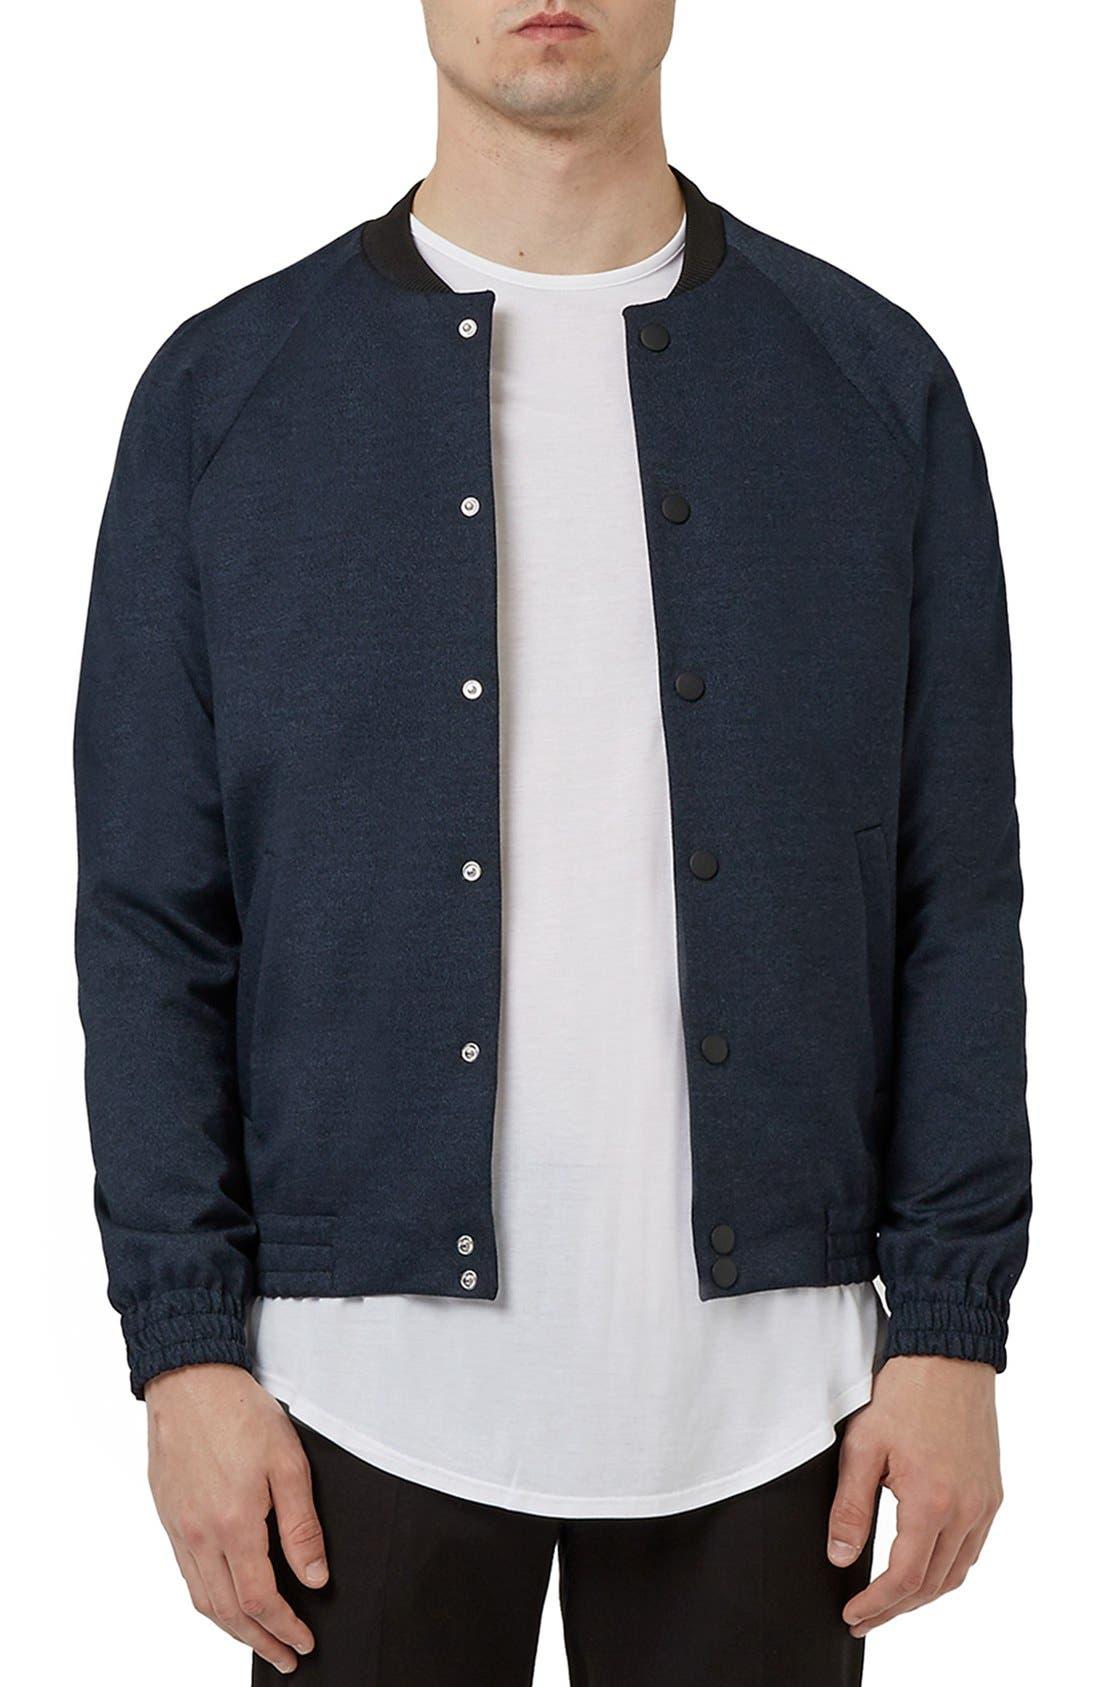 TOPMAN Tailored Fit Raglan Bomber Jacket, Main, color, 410